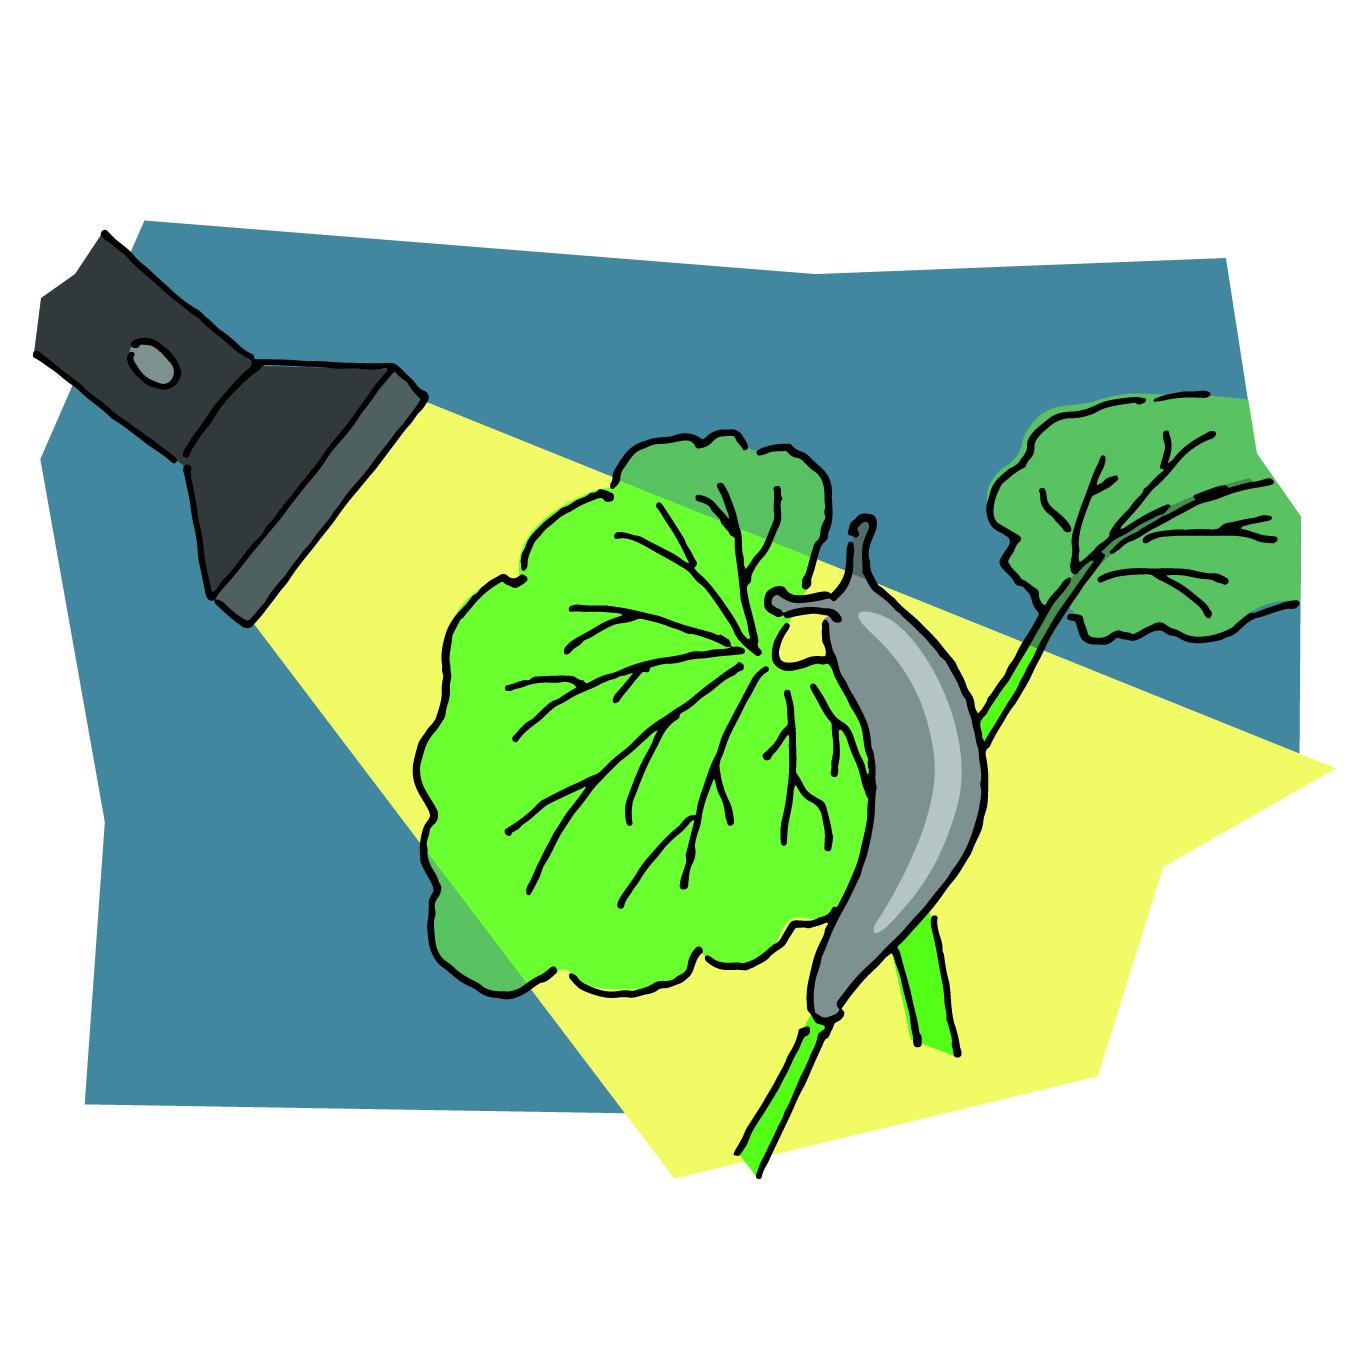 Flashlight showing slug on plant